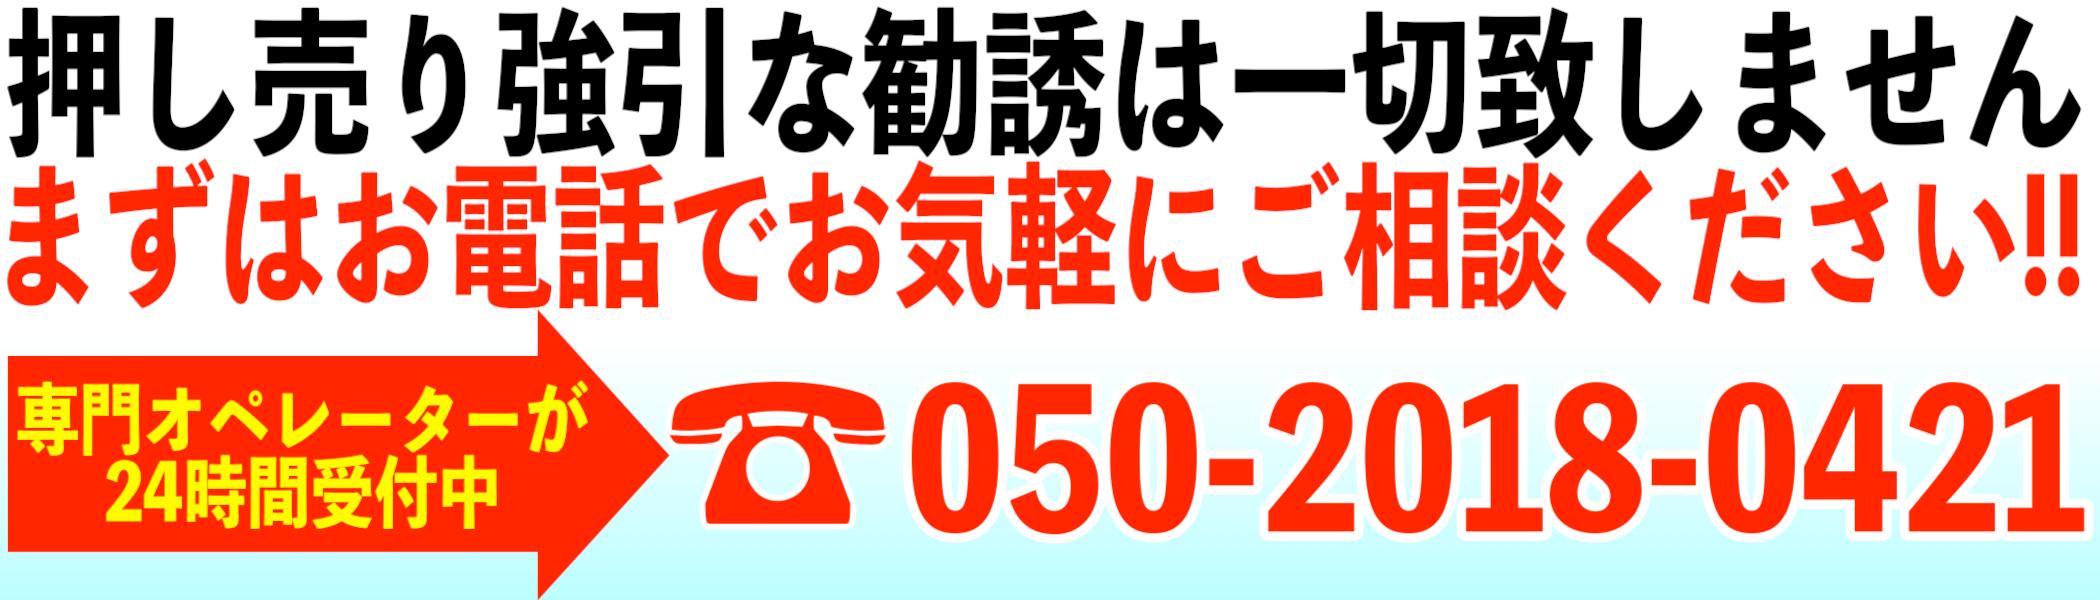 05020180421